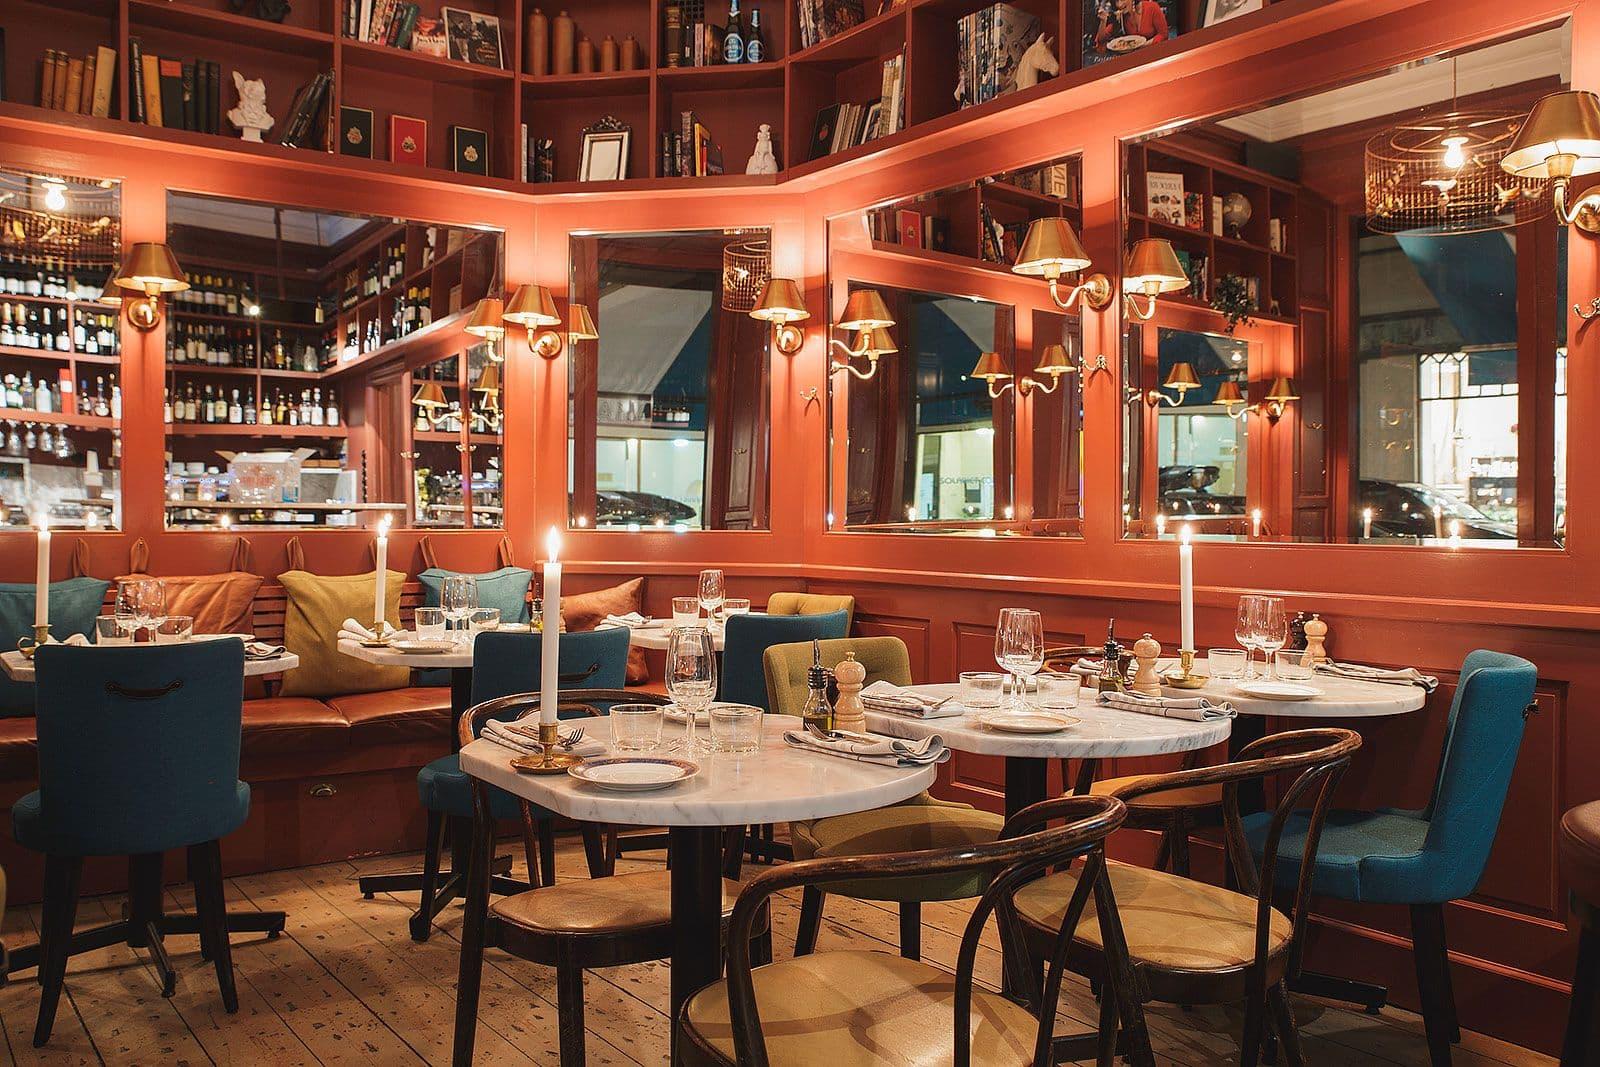 https://tastyandinteresting.be/useful-tips/soegatan-italiensk-restaurang.php